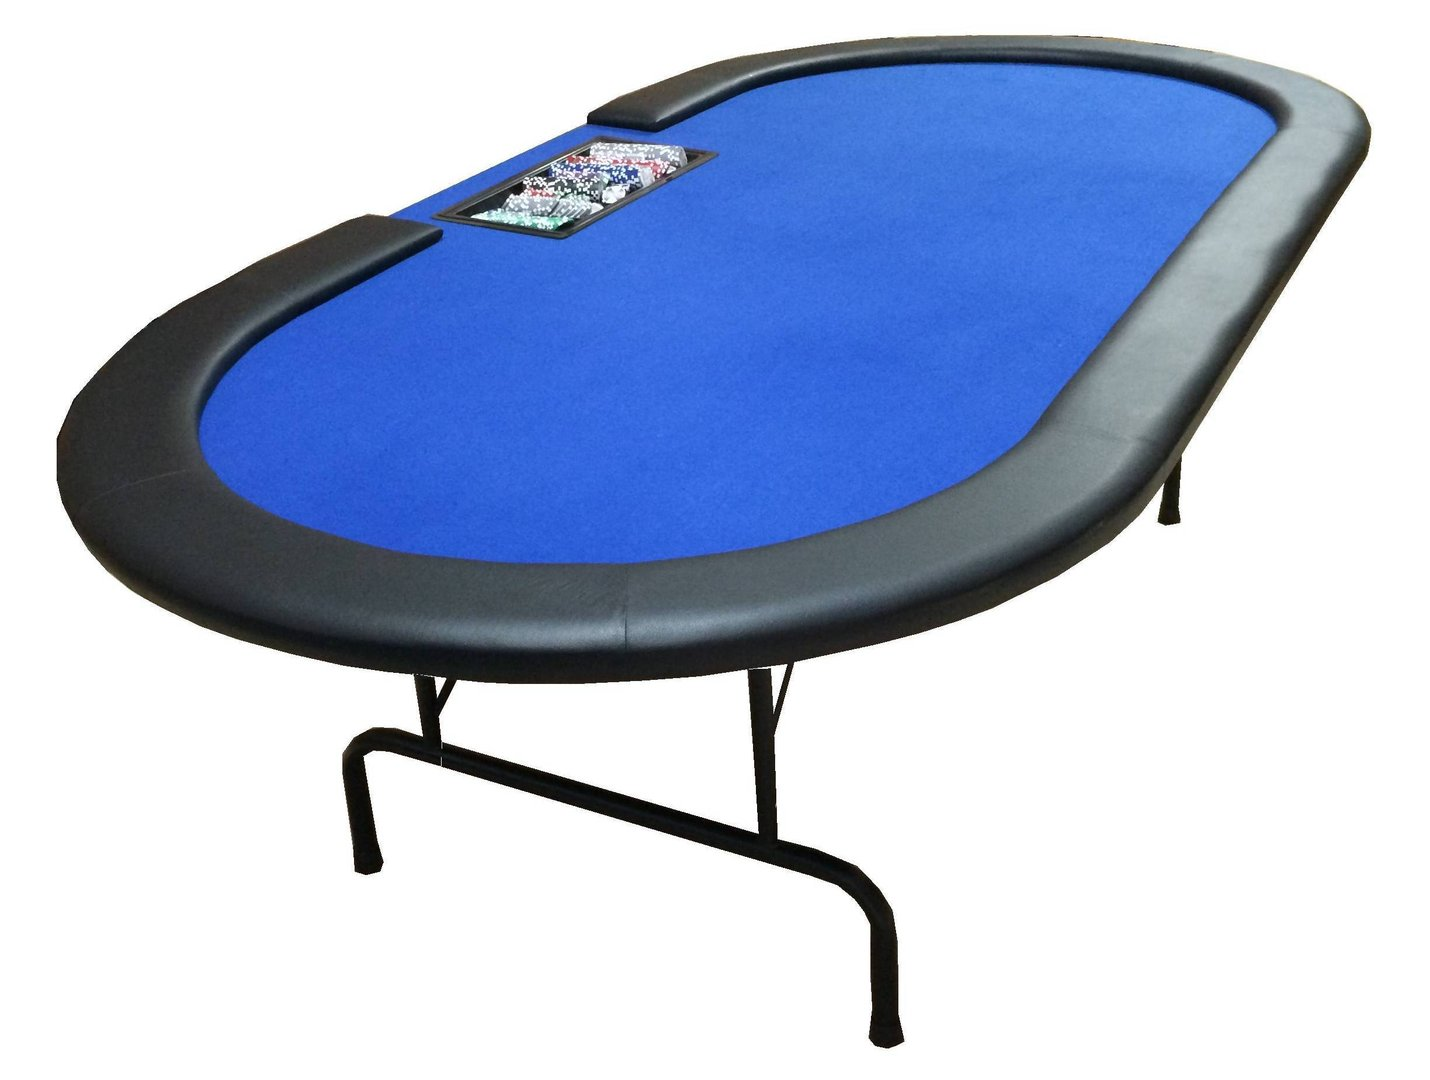 table de poker ovale avec croupier 240cm. Black Bedroom Furniture Sets. Home Design Ideas